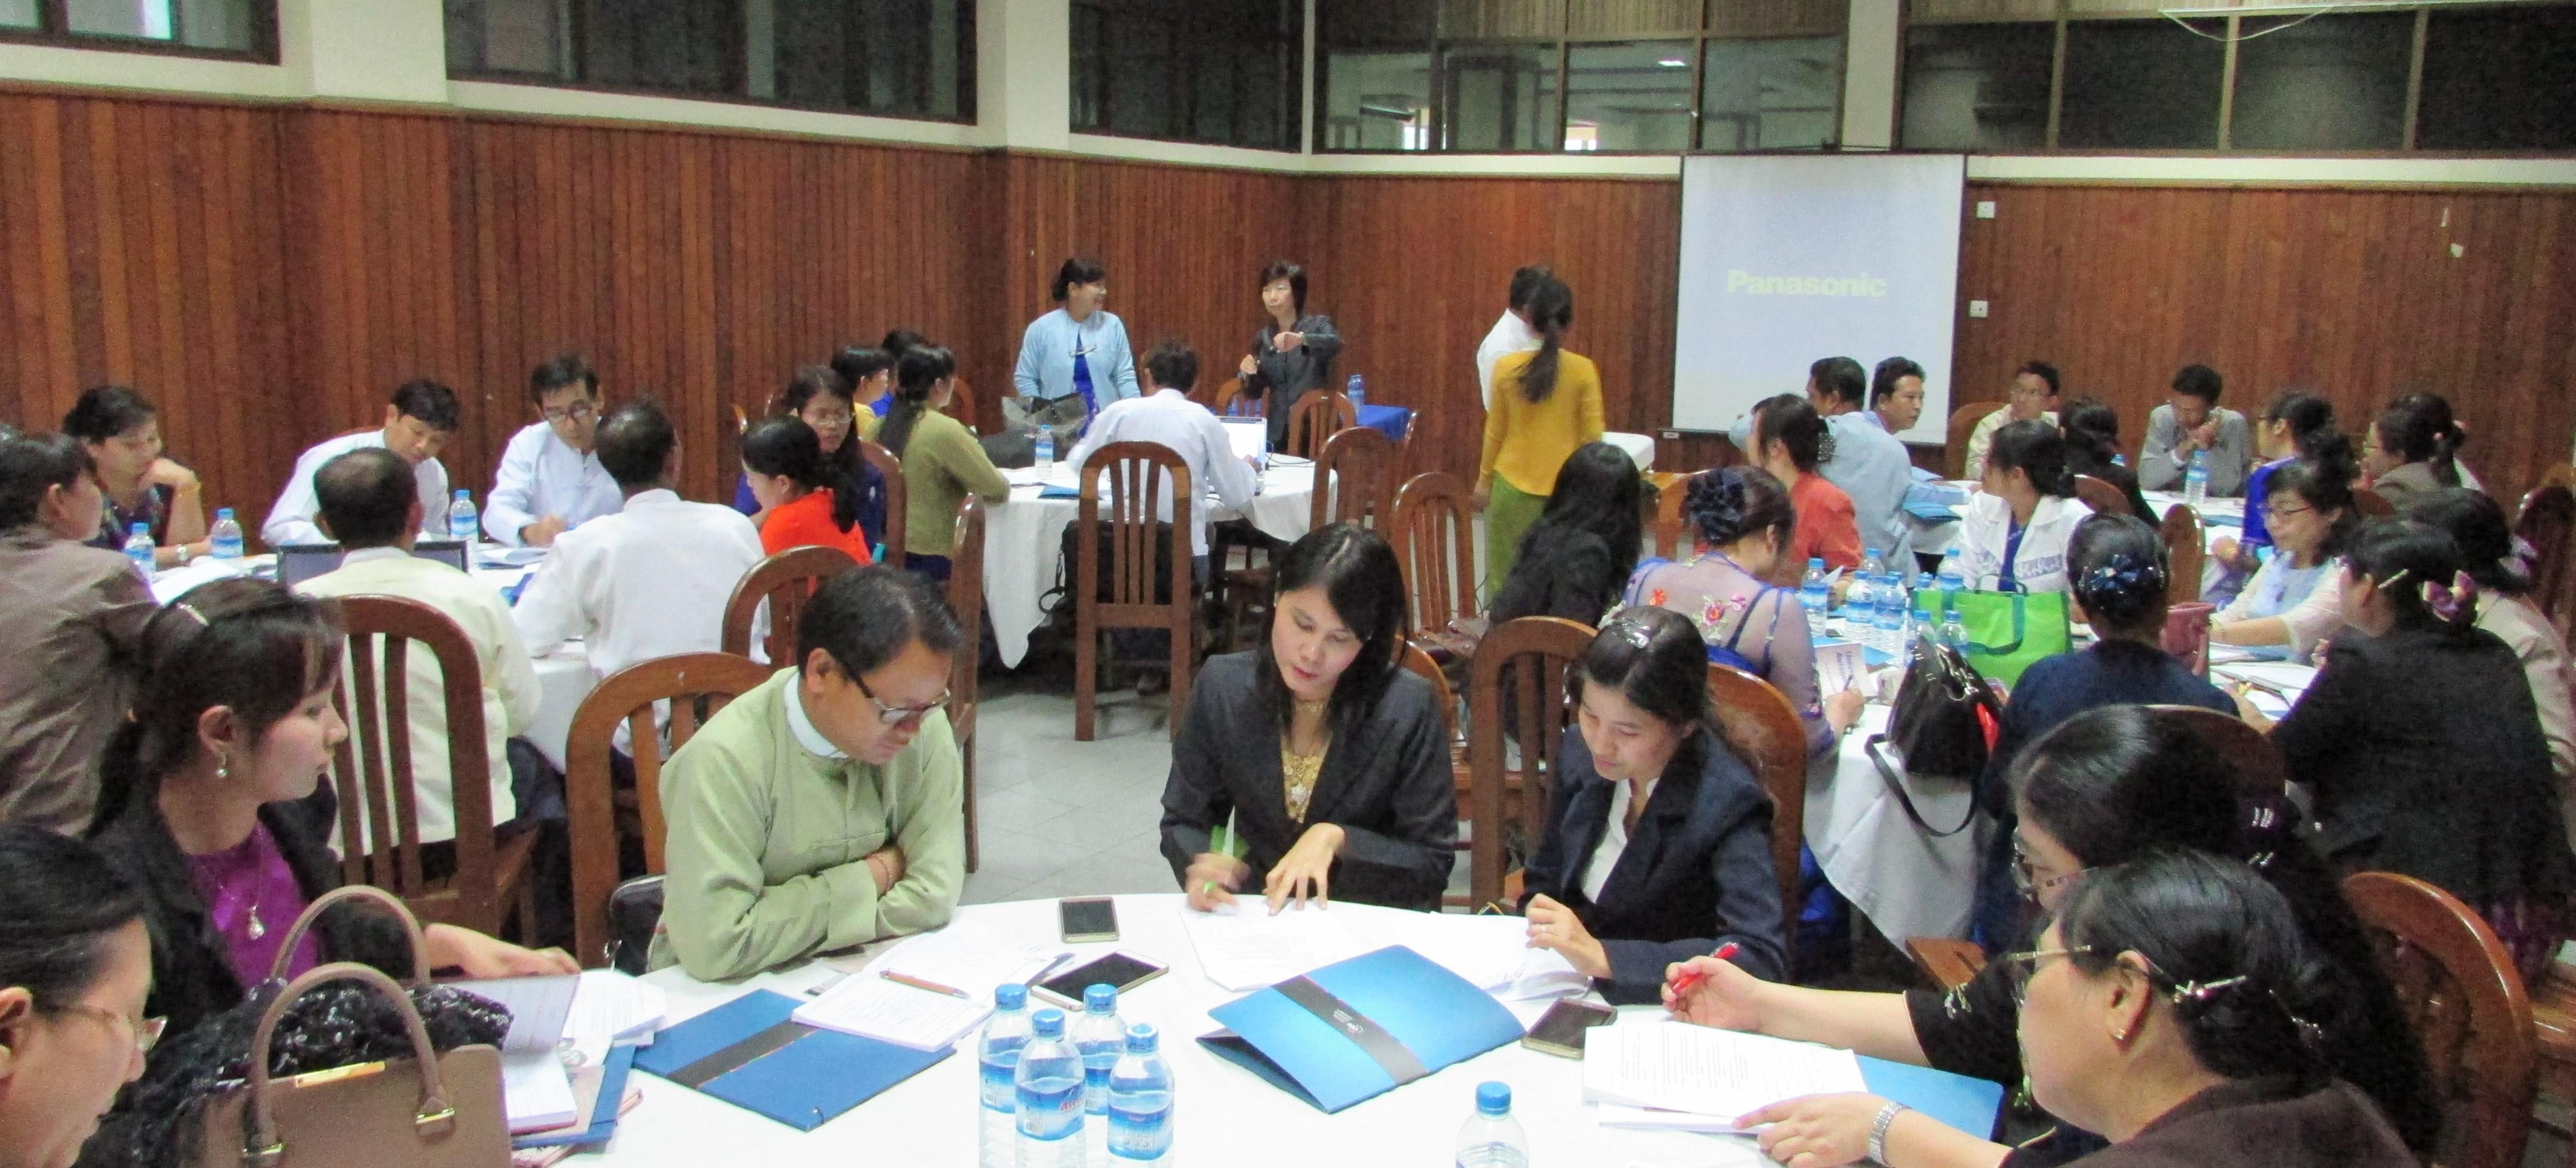 Breakout session of the workshop organized by CEU, Diamond Jubilee Hall, Yangon, January 2017